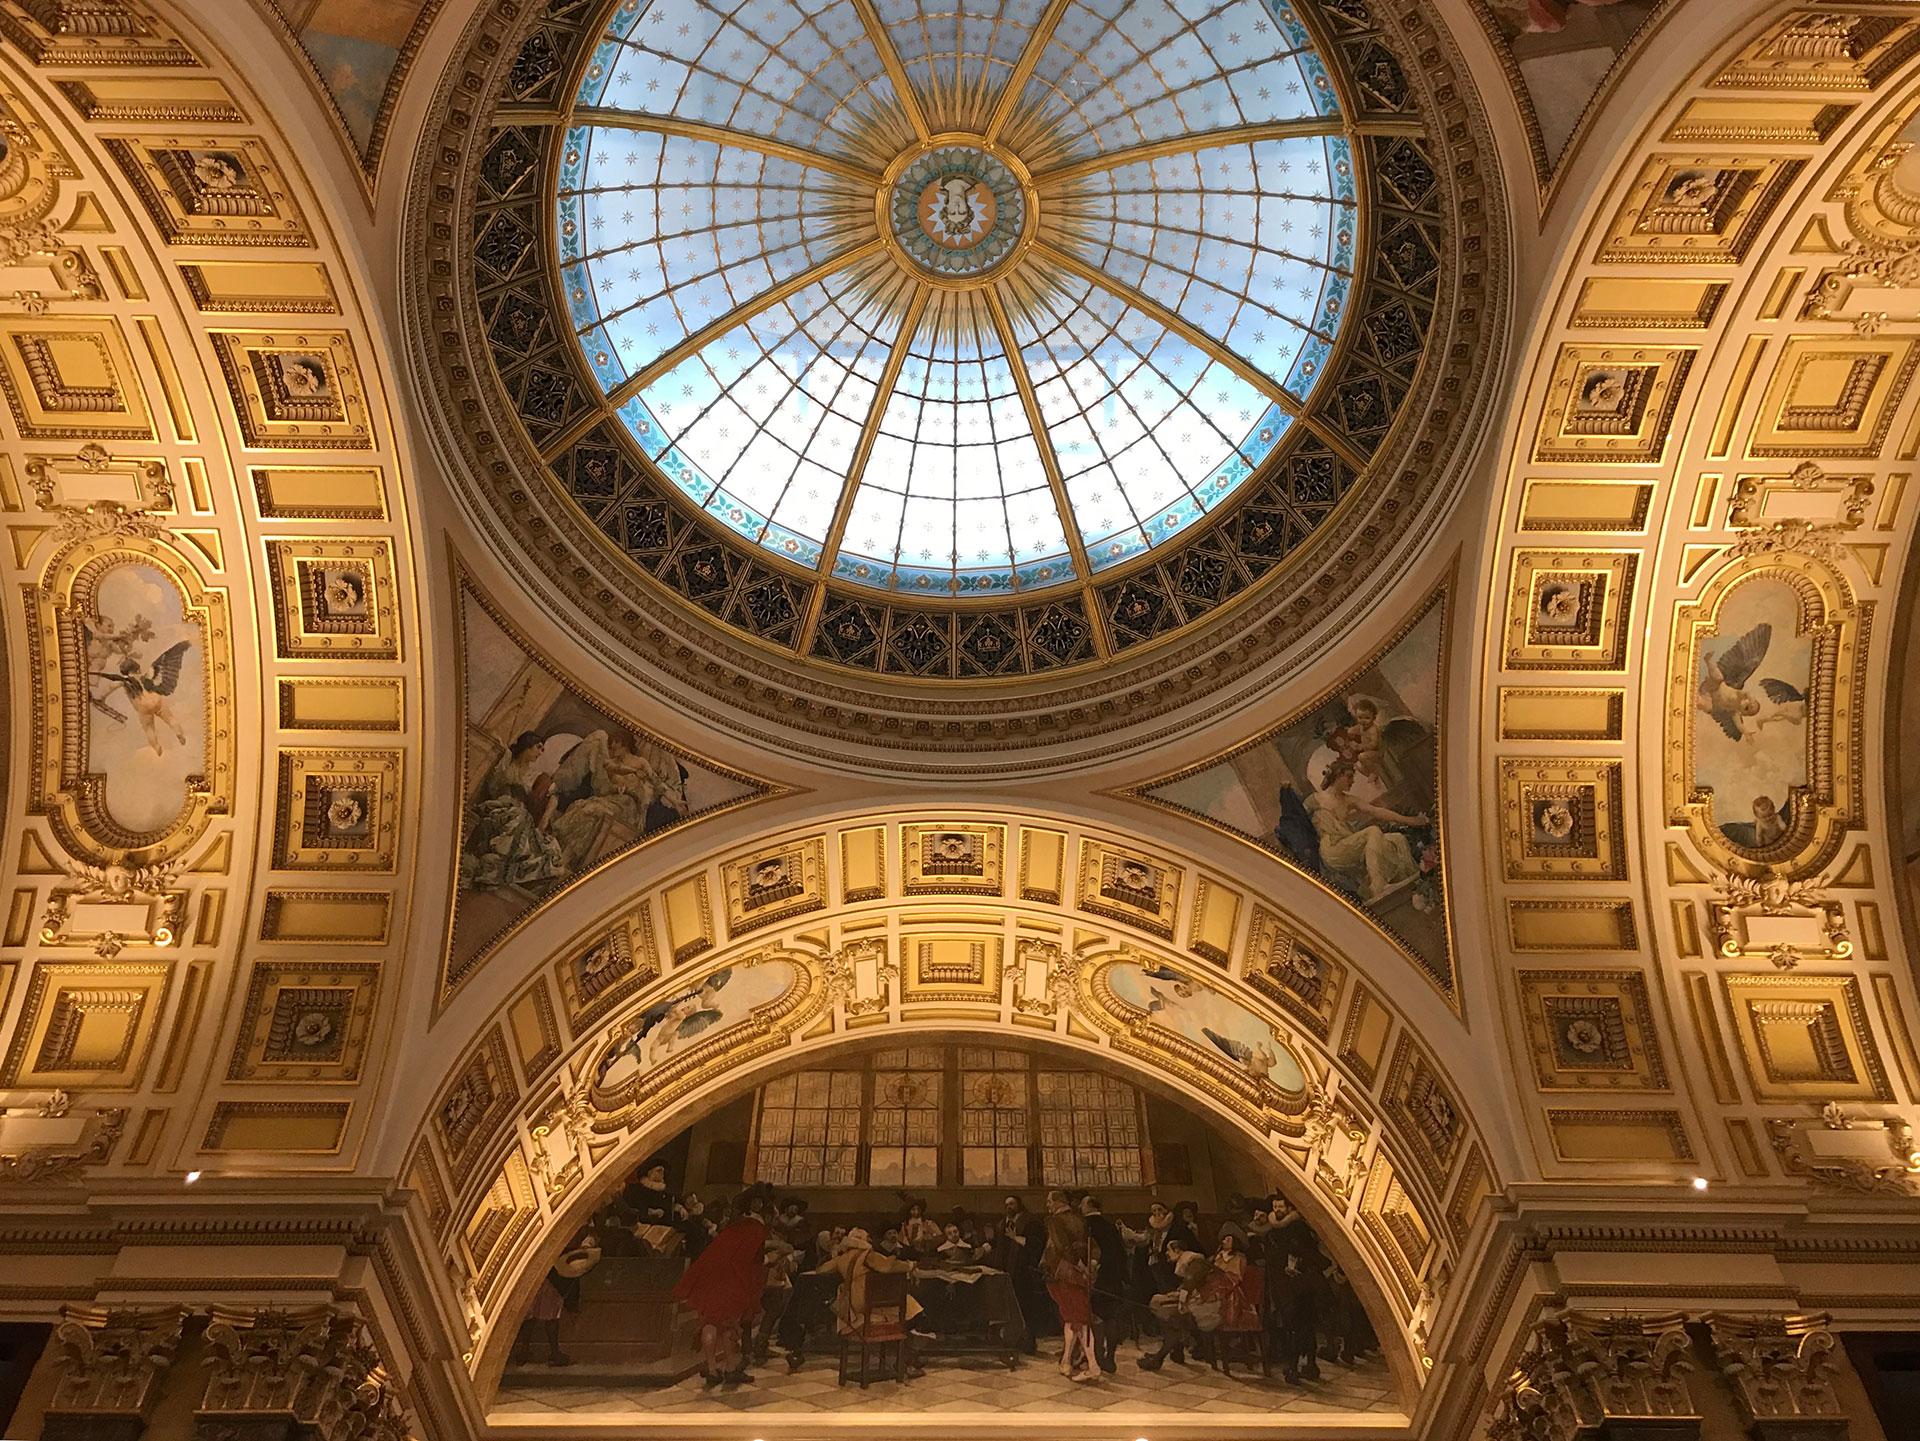 Praha / Kansallismuseo